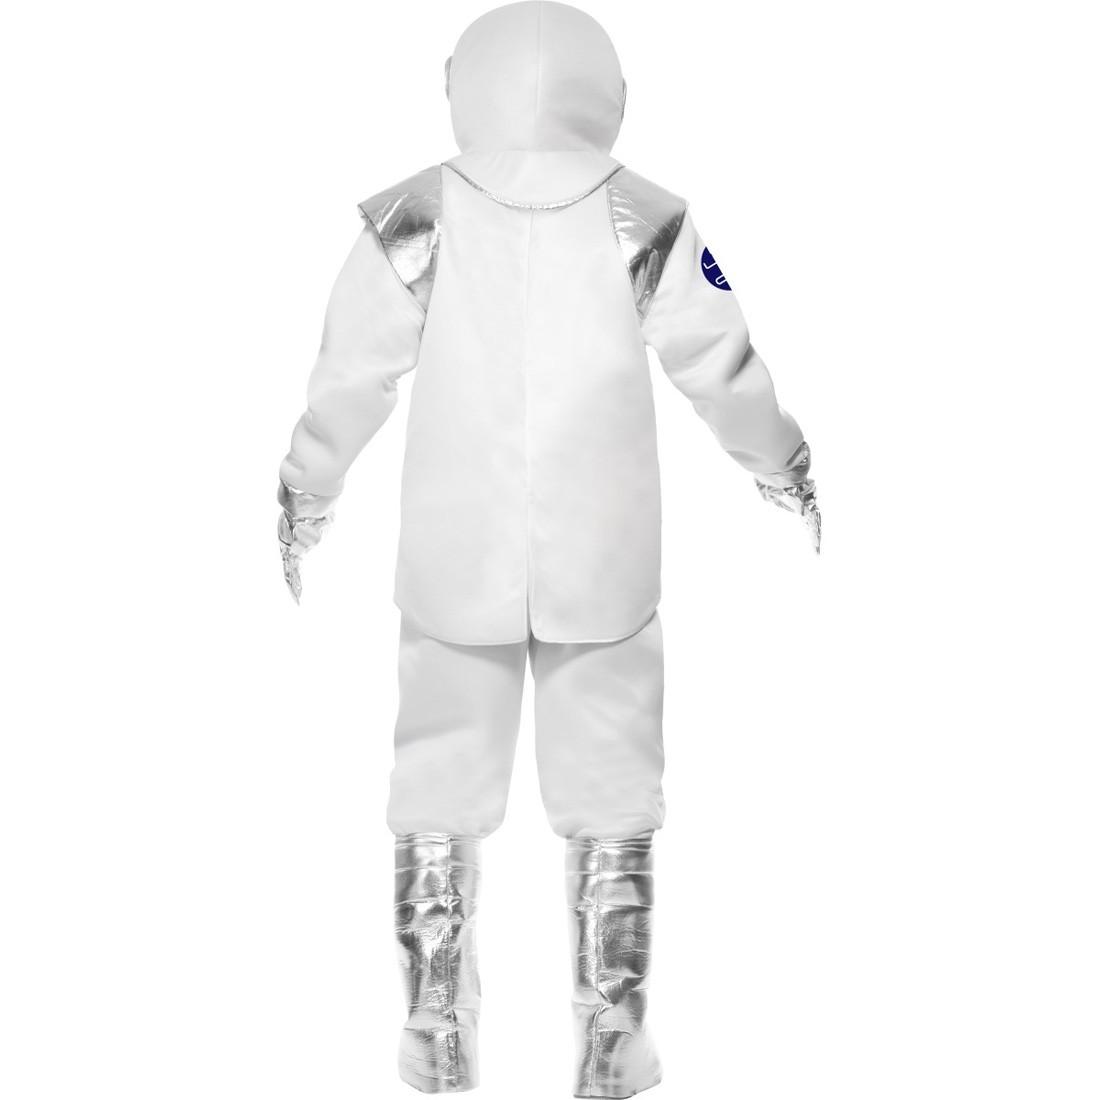 astronautenanzug m 48 50 anzug astronaut astronautenkost m. Black Bedroom Furniture Sets. Home Design Ideas